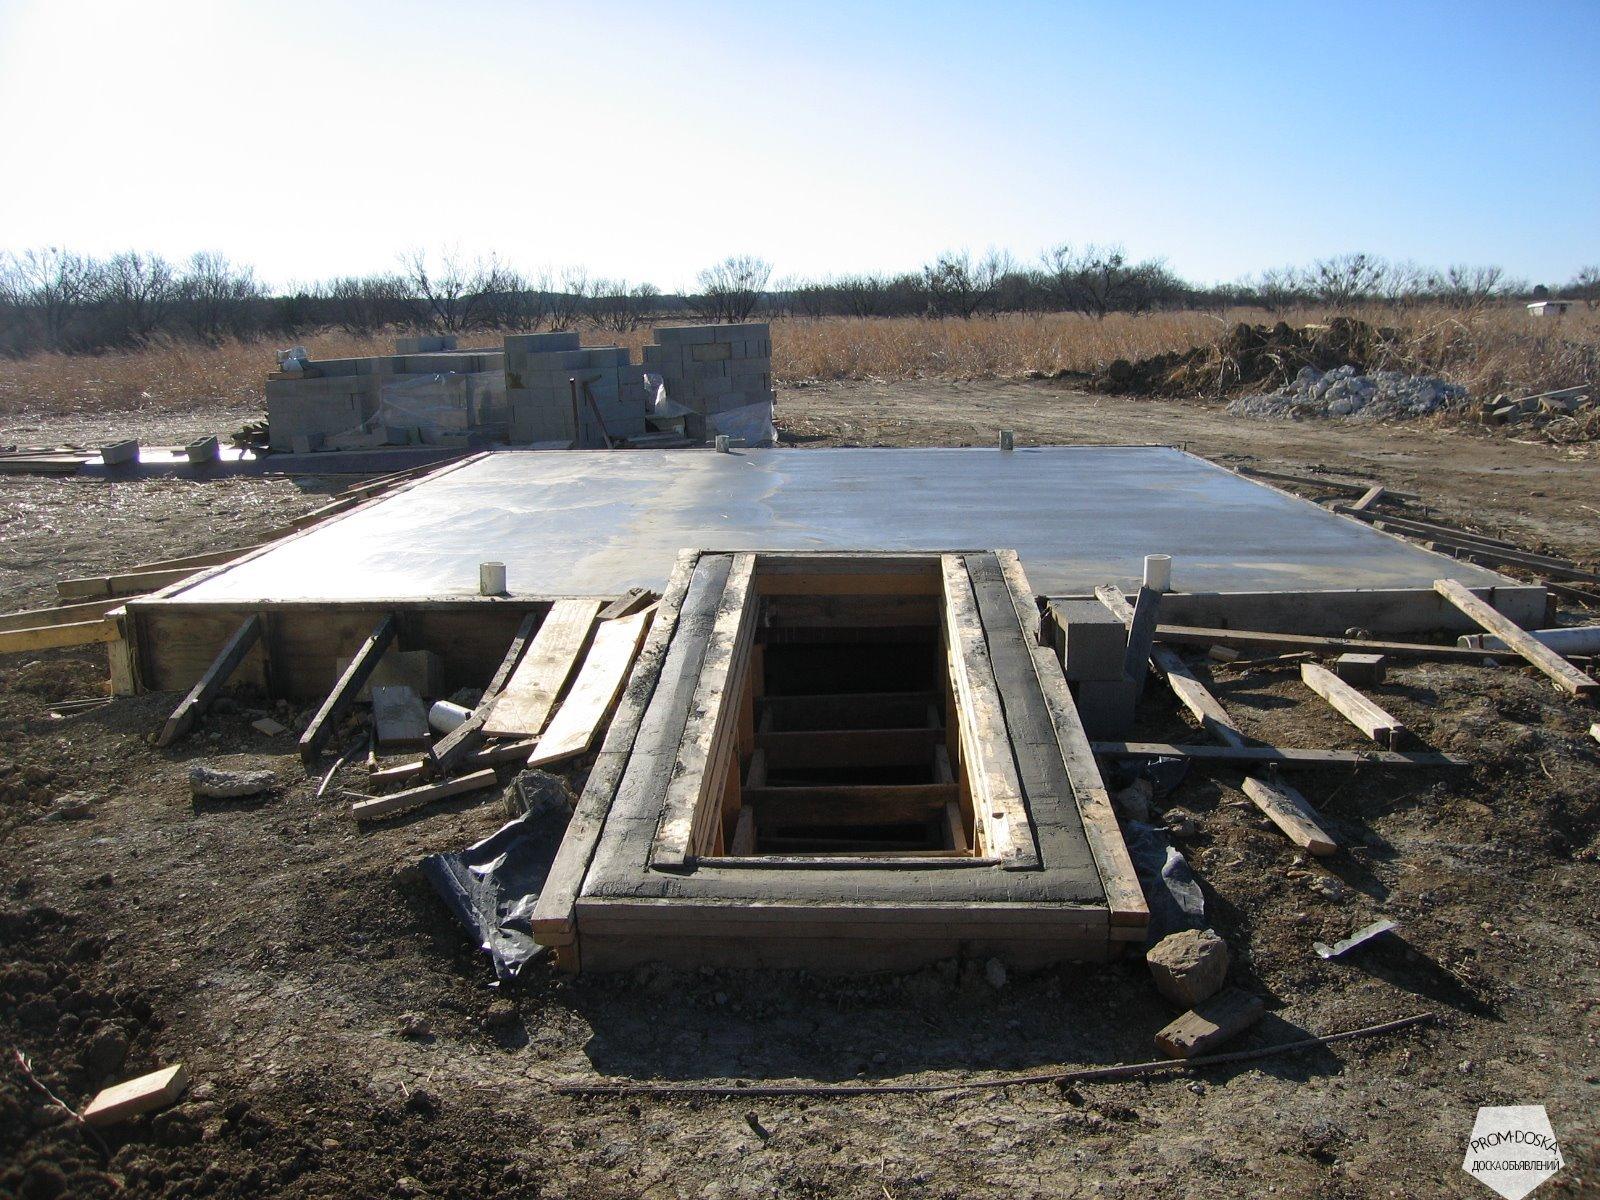 Как построить бункер самому? - Stroitelstvo. org 60